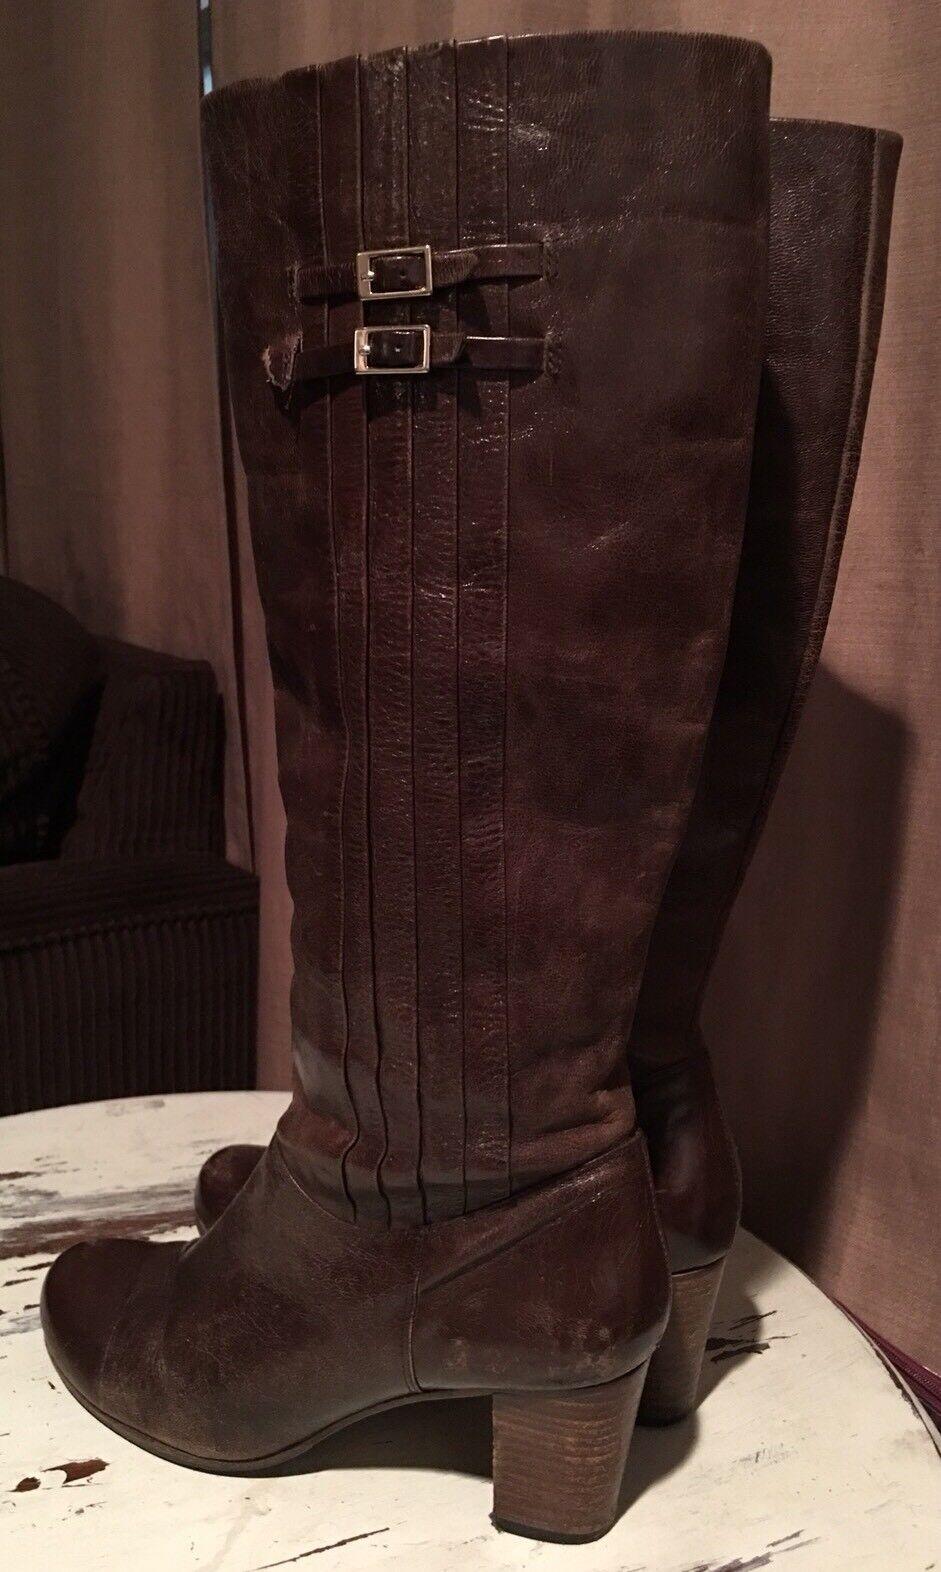 Frye Nora 16L Dark Braun Distressed Patent Leder Knee High Pleated Boot 8 1/2